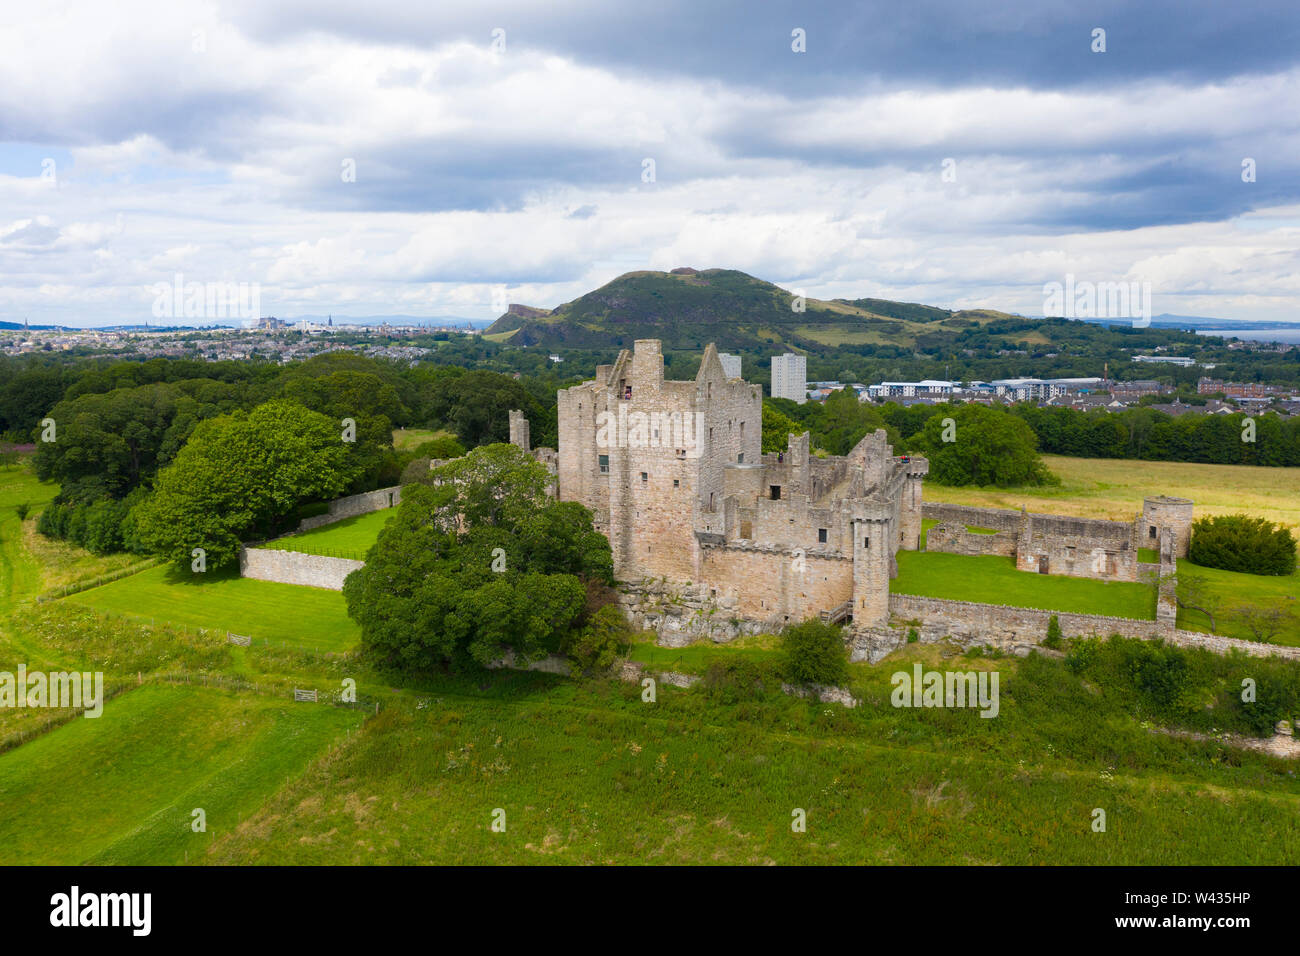 Elevated view of Craigmillar Castle and skyline of Edinburgh, Scotland UK. Stock Photo